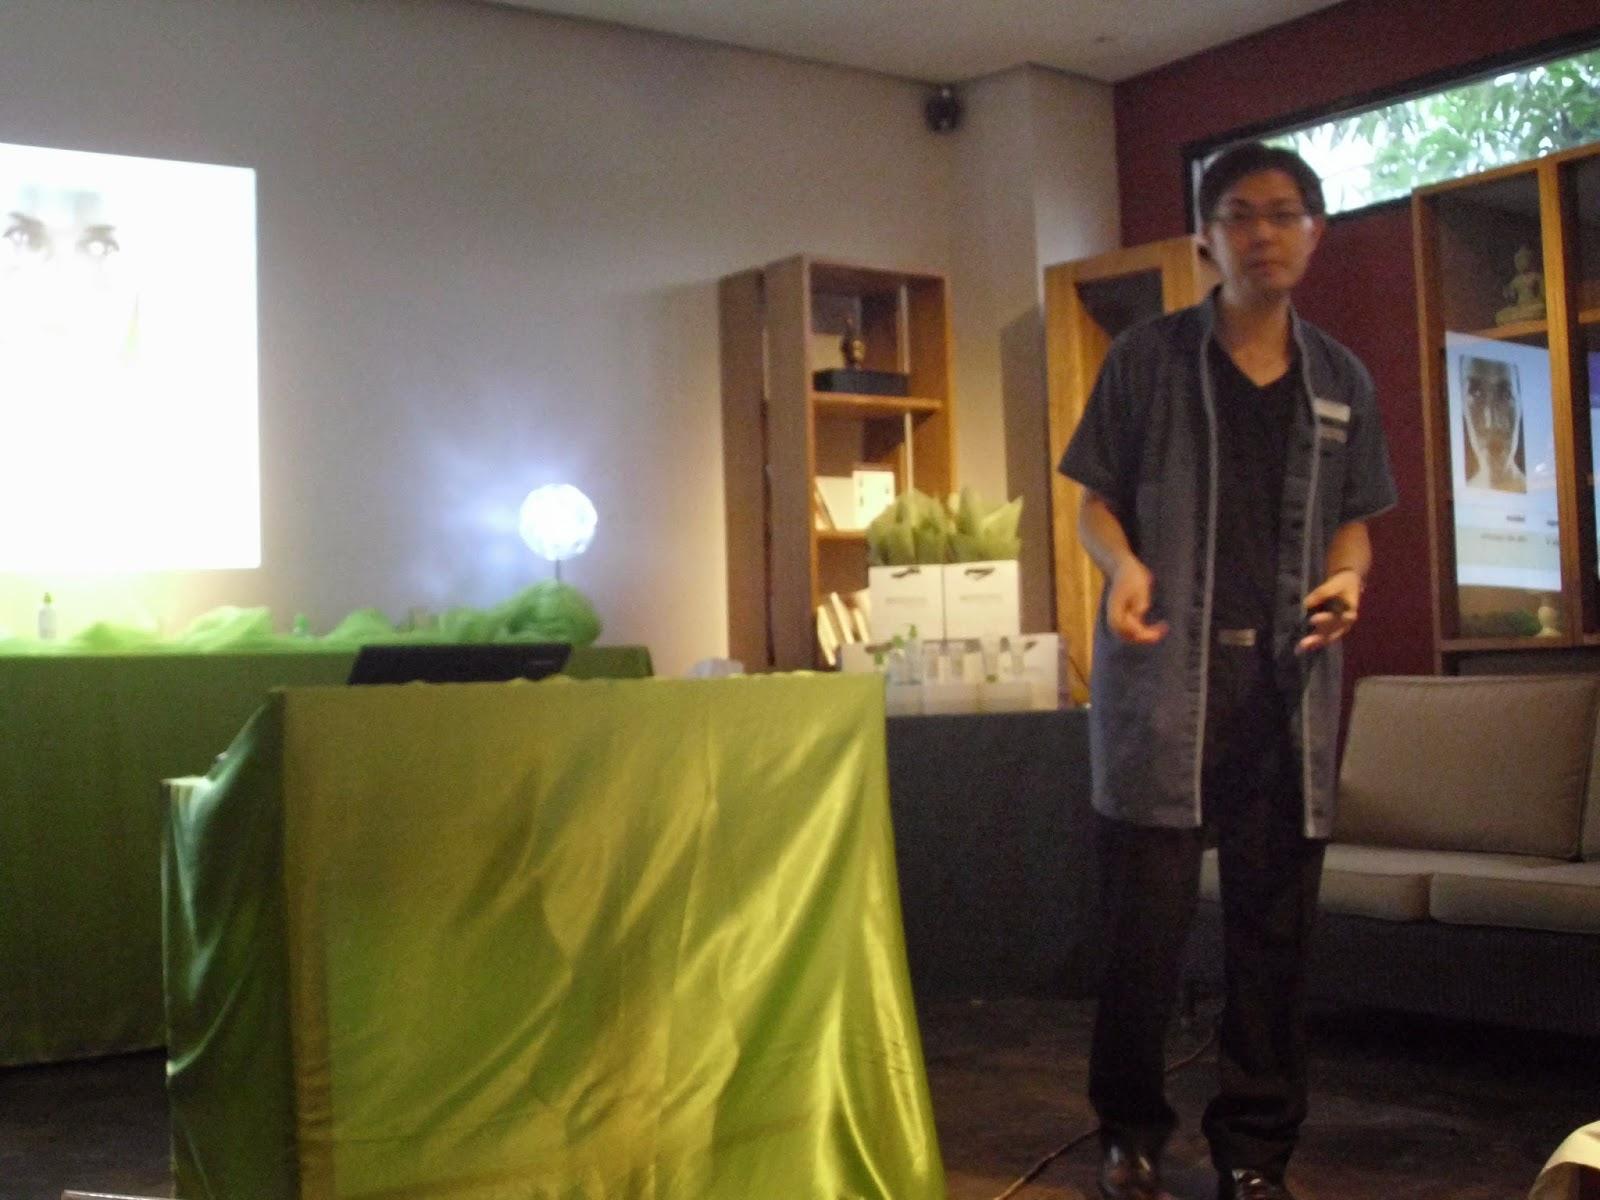 bioderma sebium, bioderma sebium indonesia